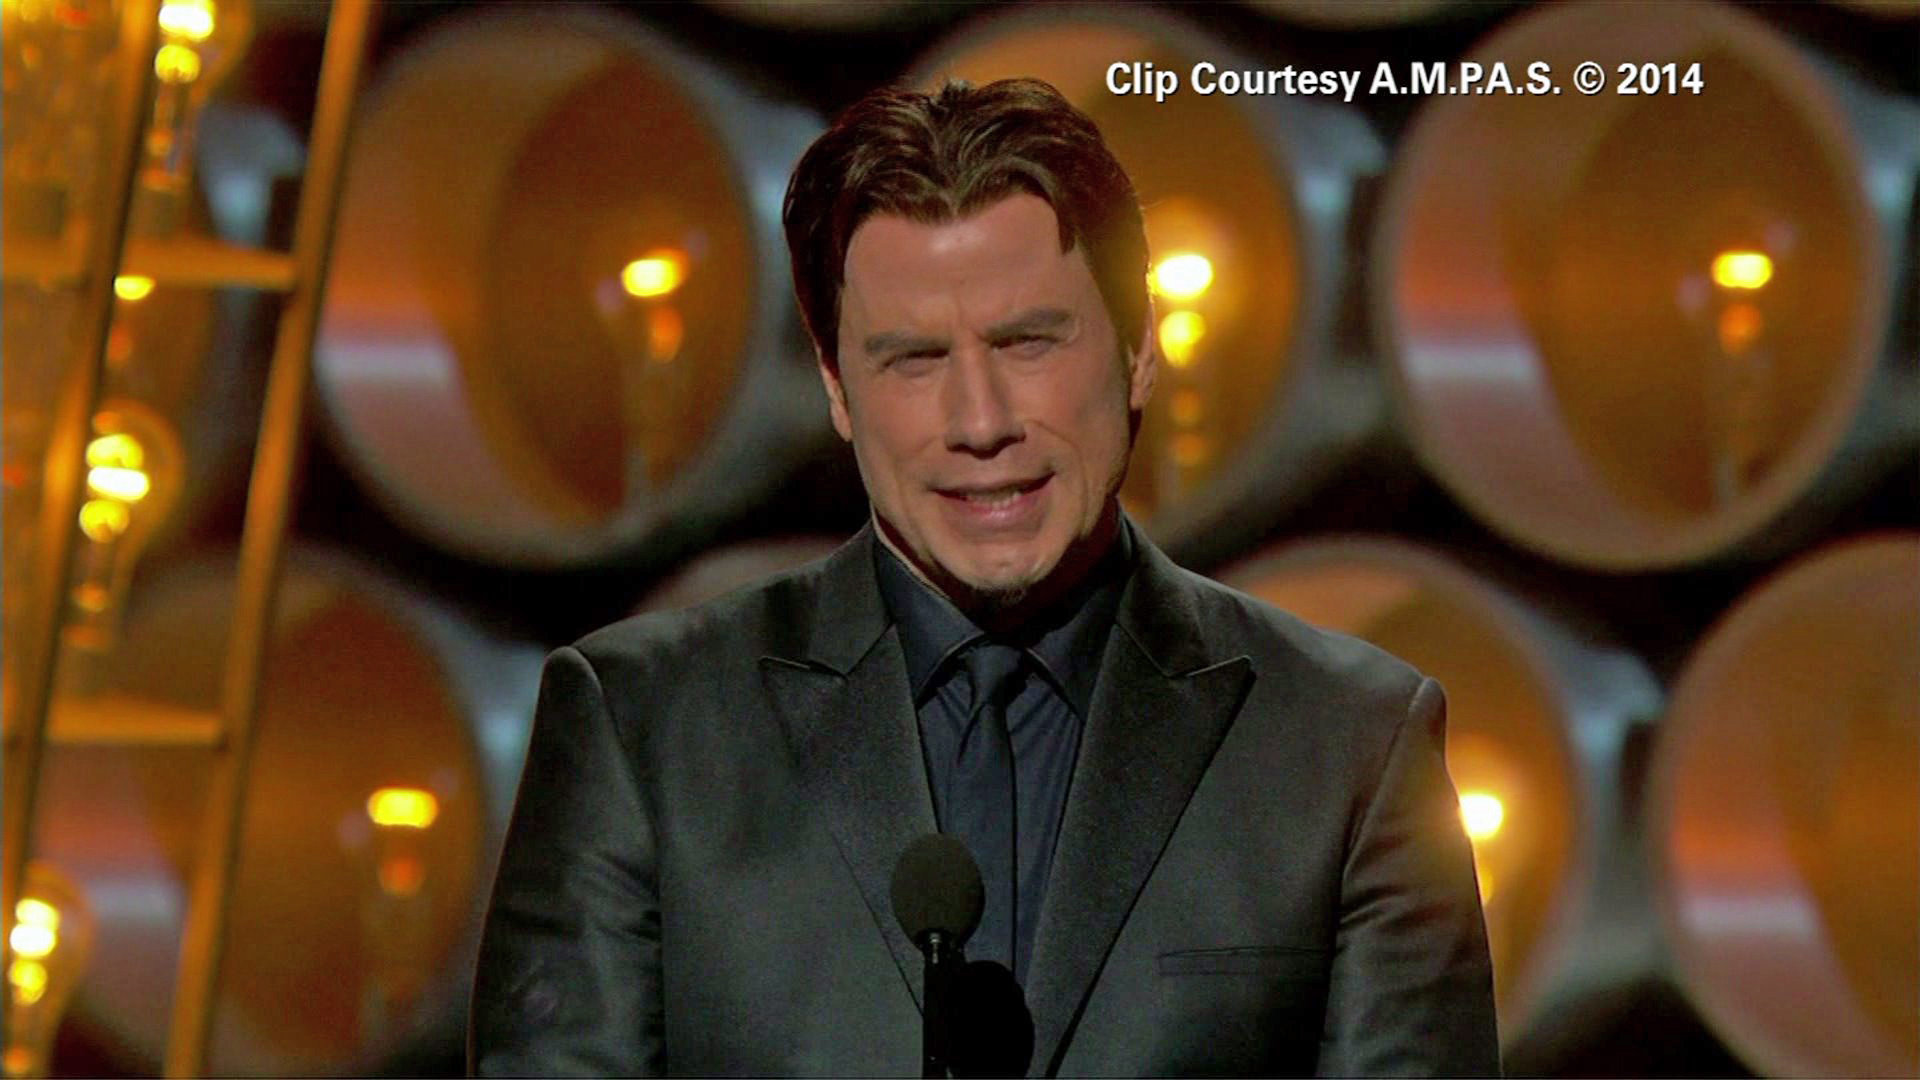 Let John Travolta 'Travoltify' YOUR name with this 'Adela Dazeem' name generator